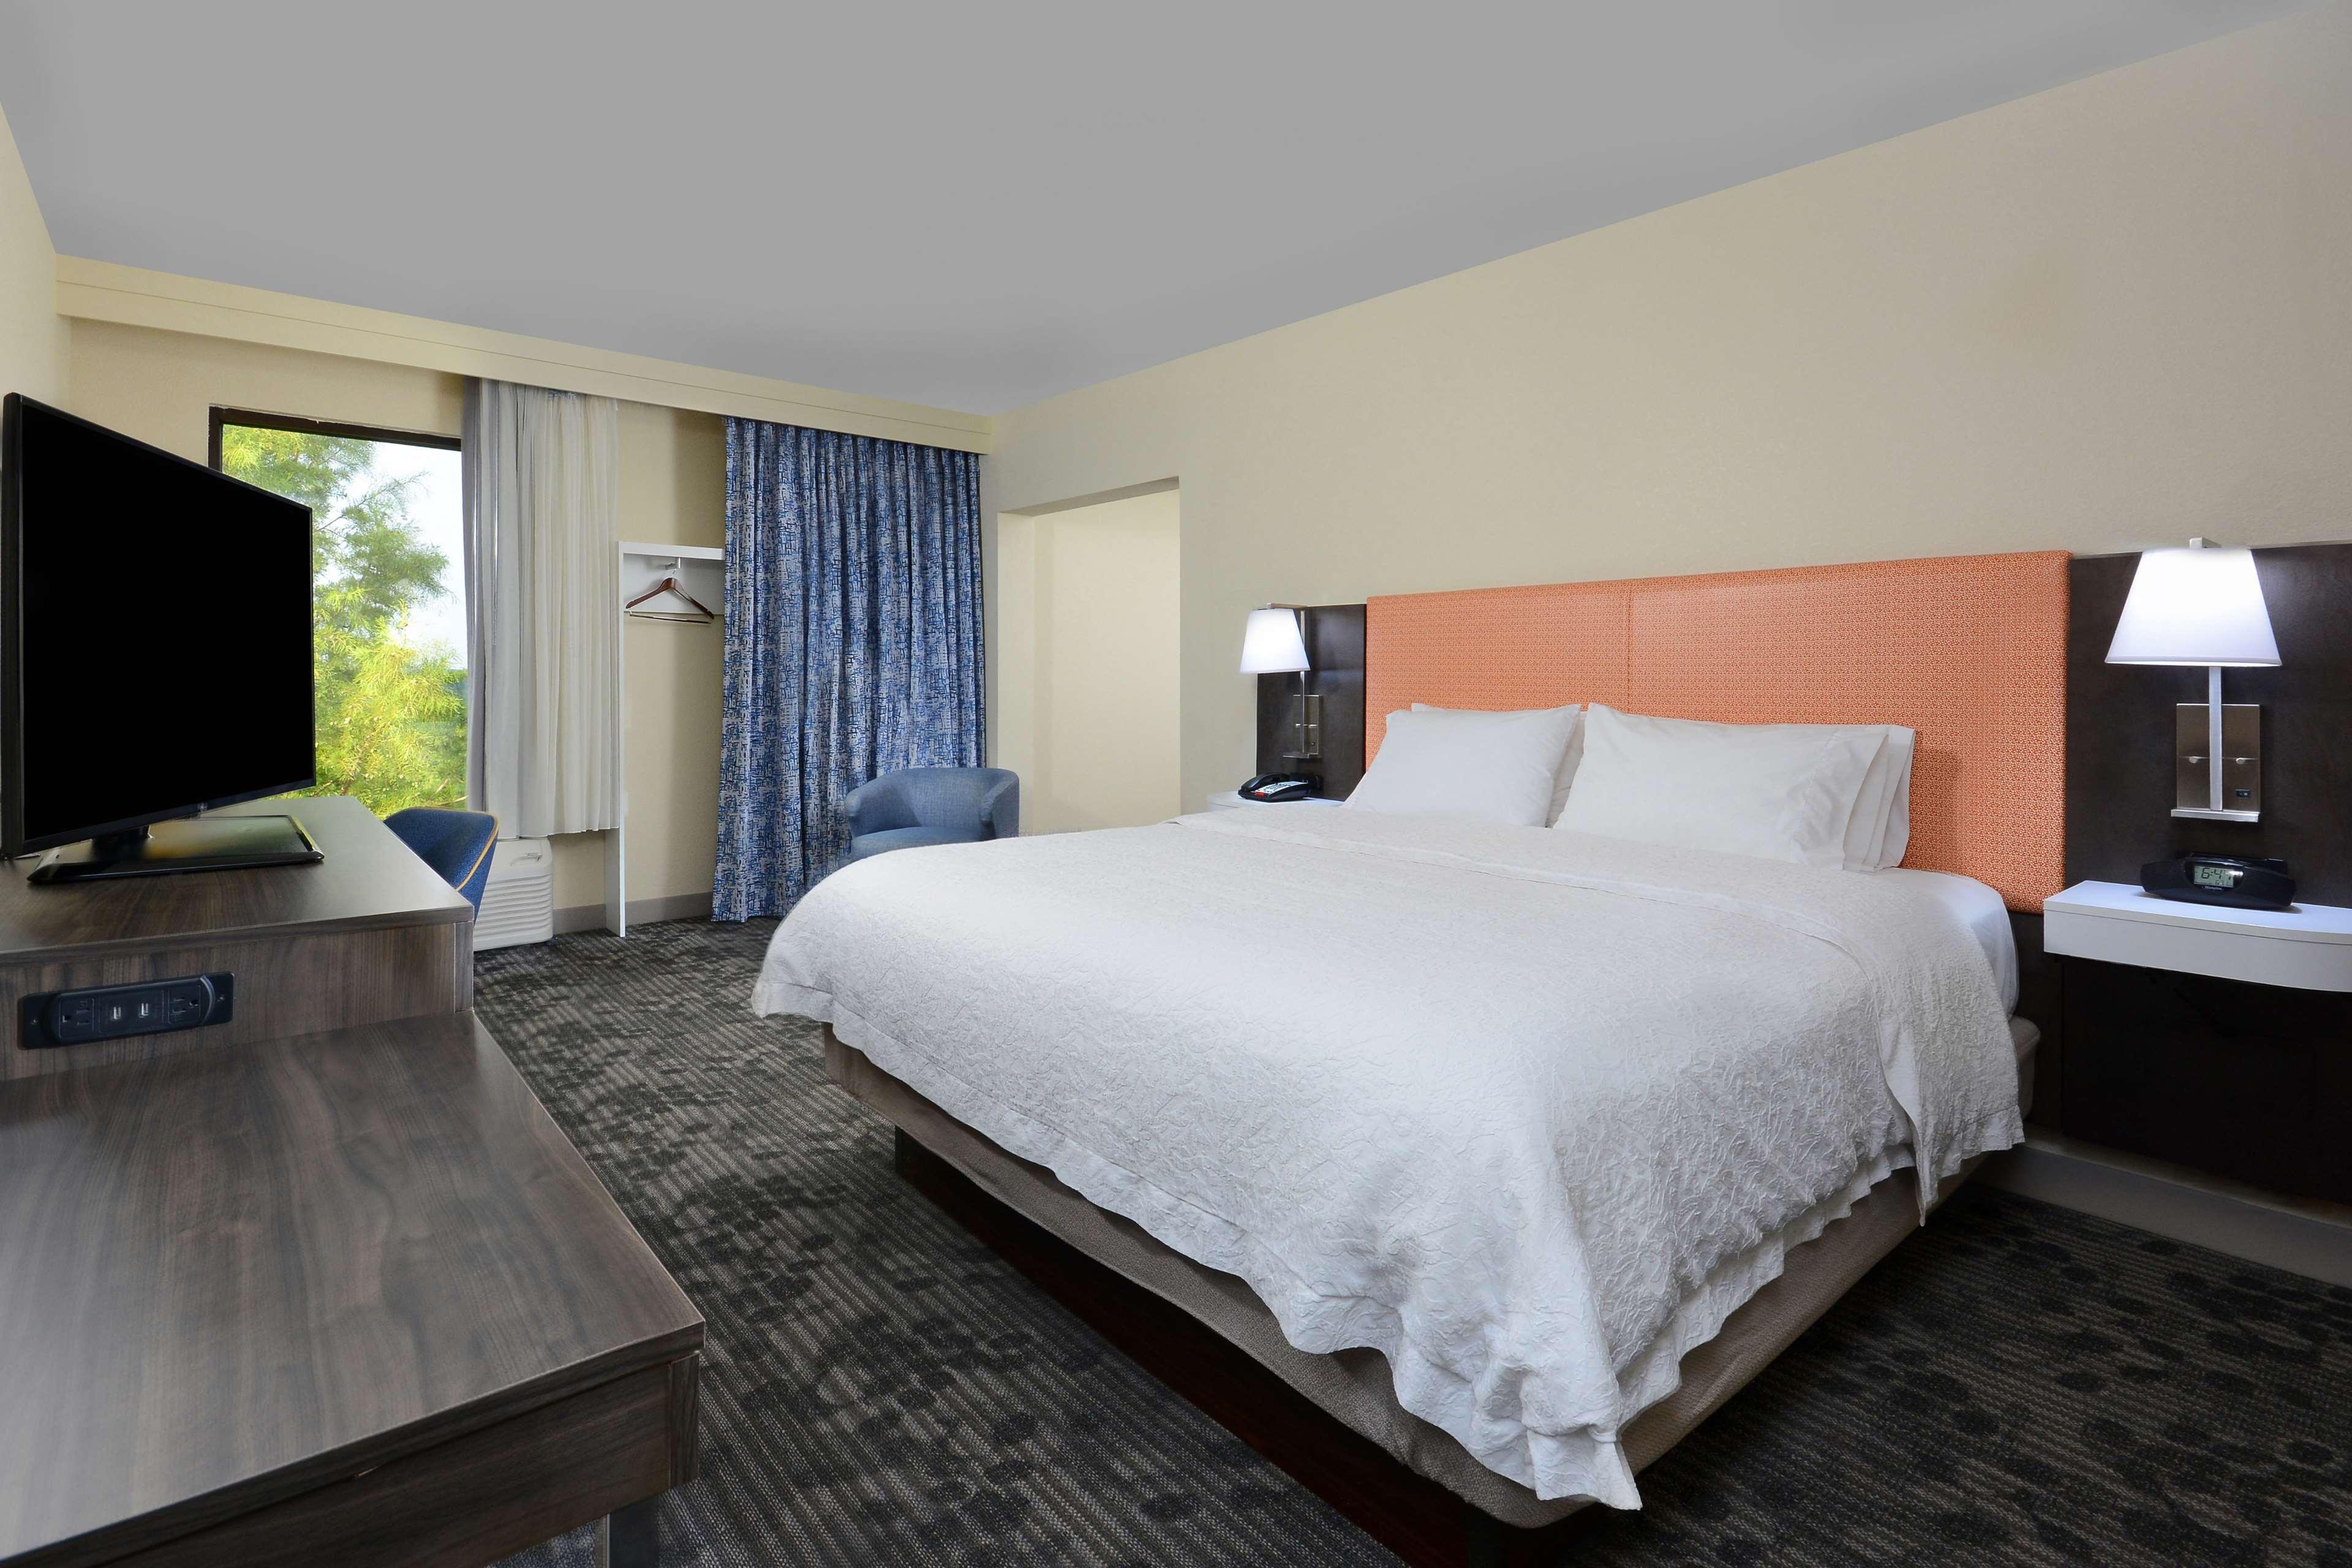 Hampton Inn & Suites Greenville/Spartanburg I-85 image 44